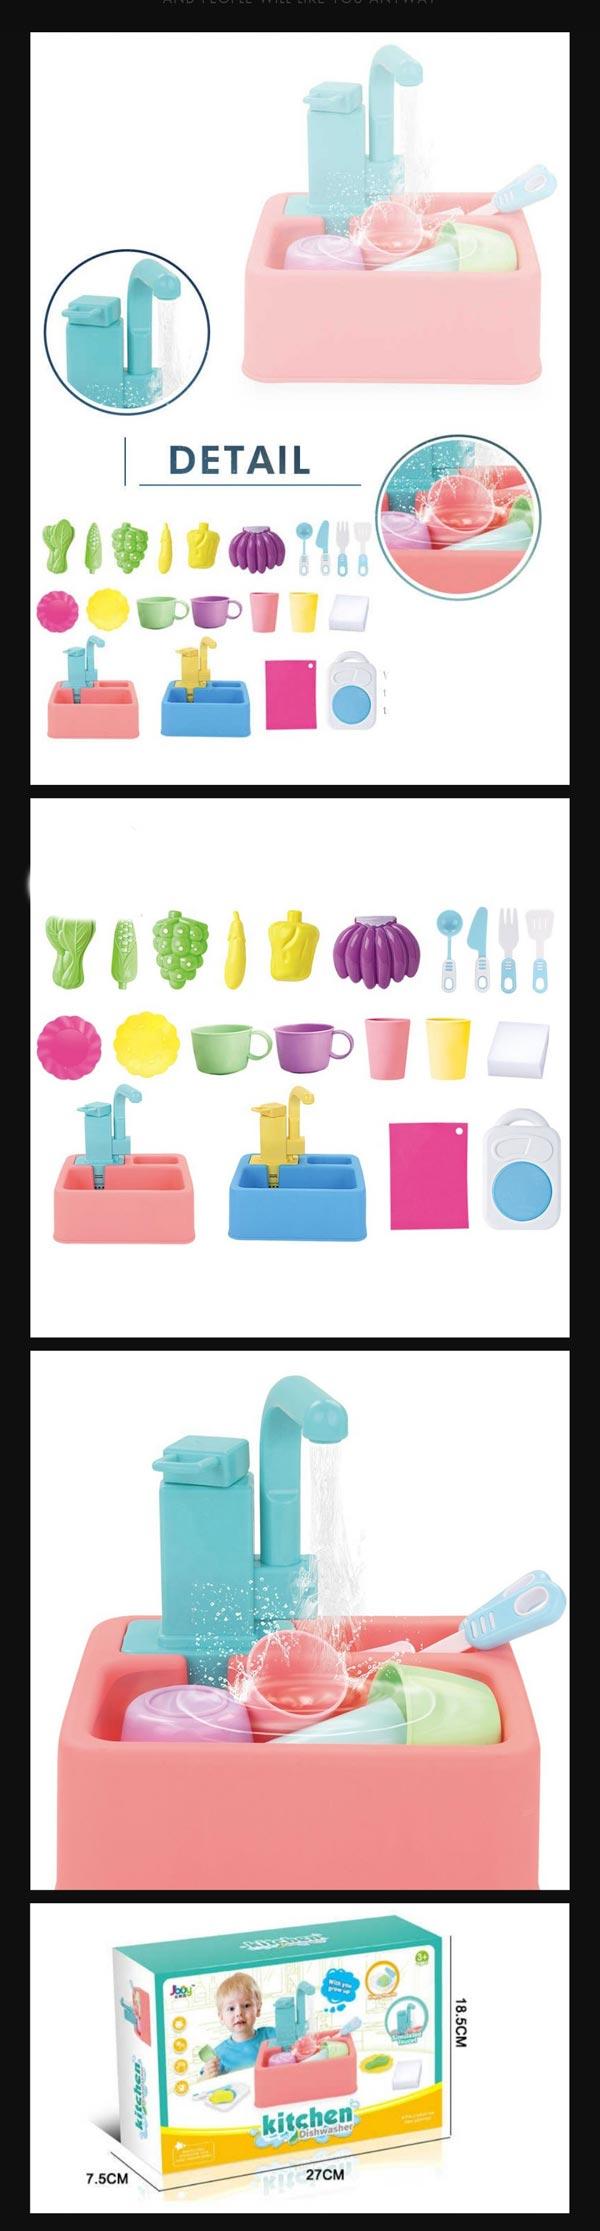 Kids Dishwasher Toy